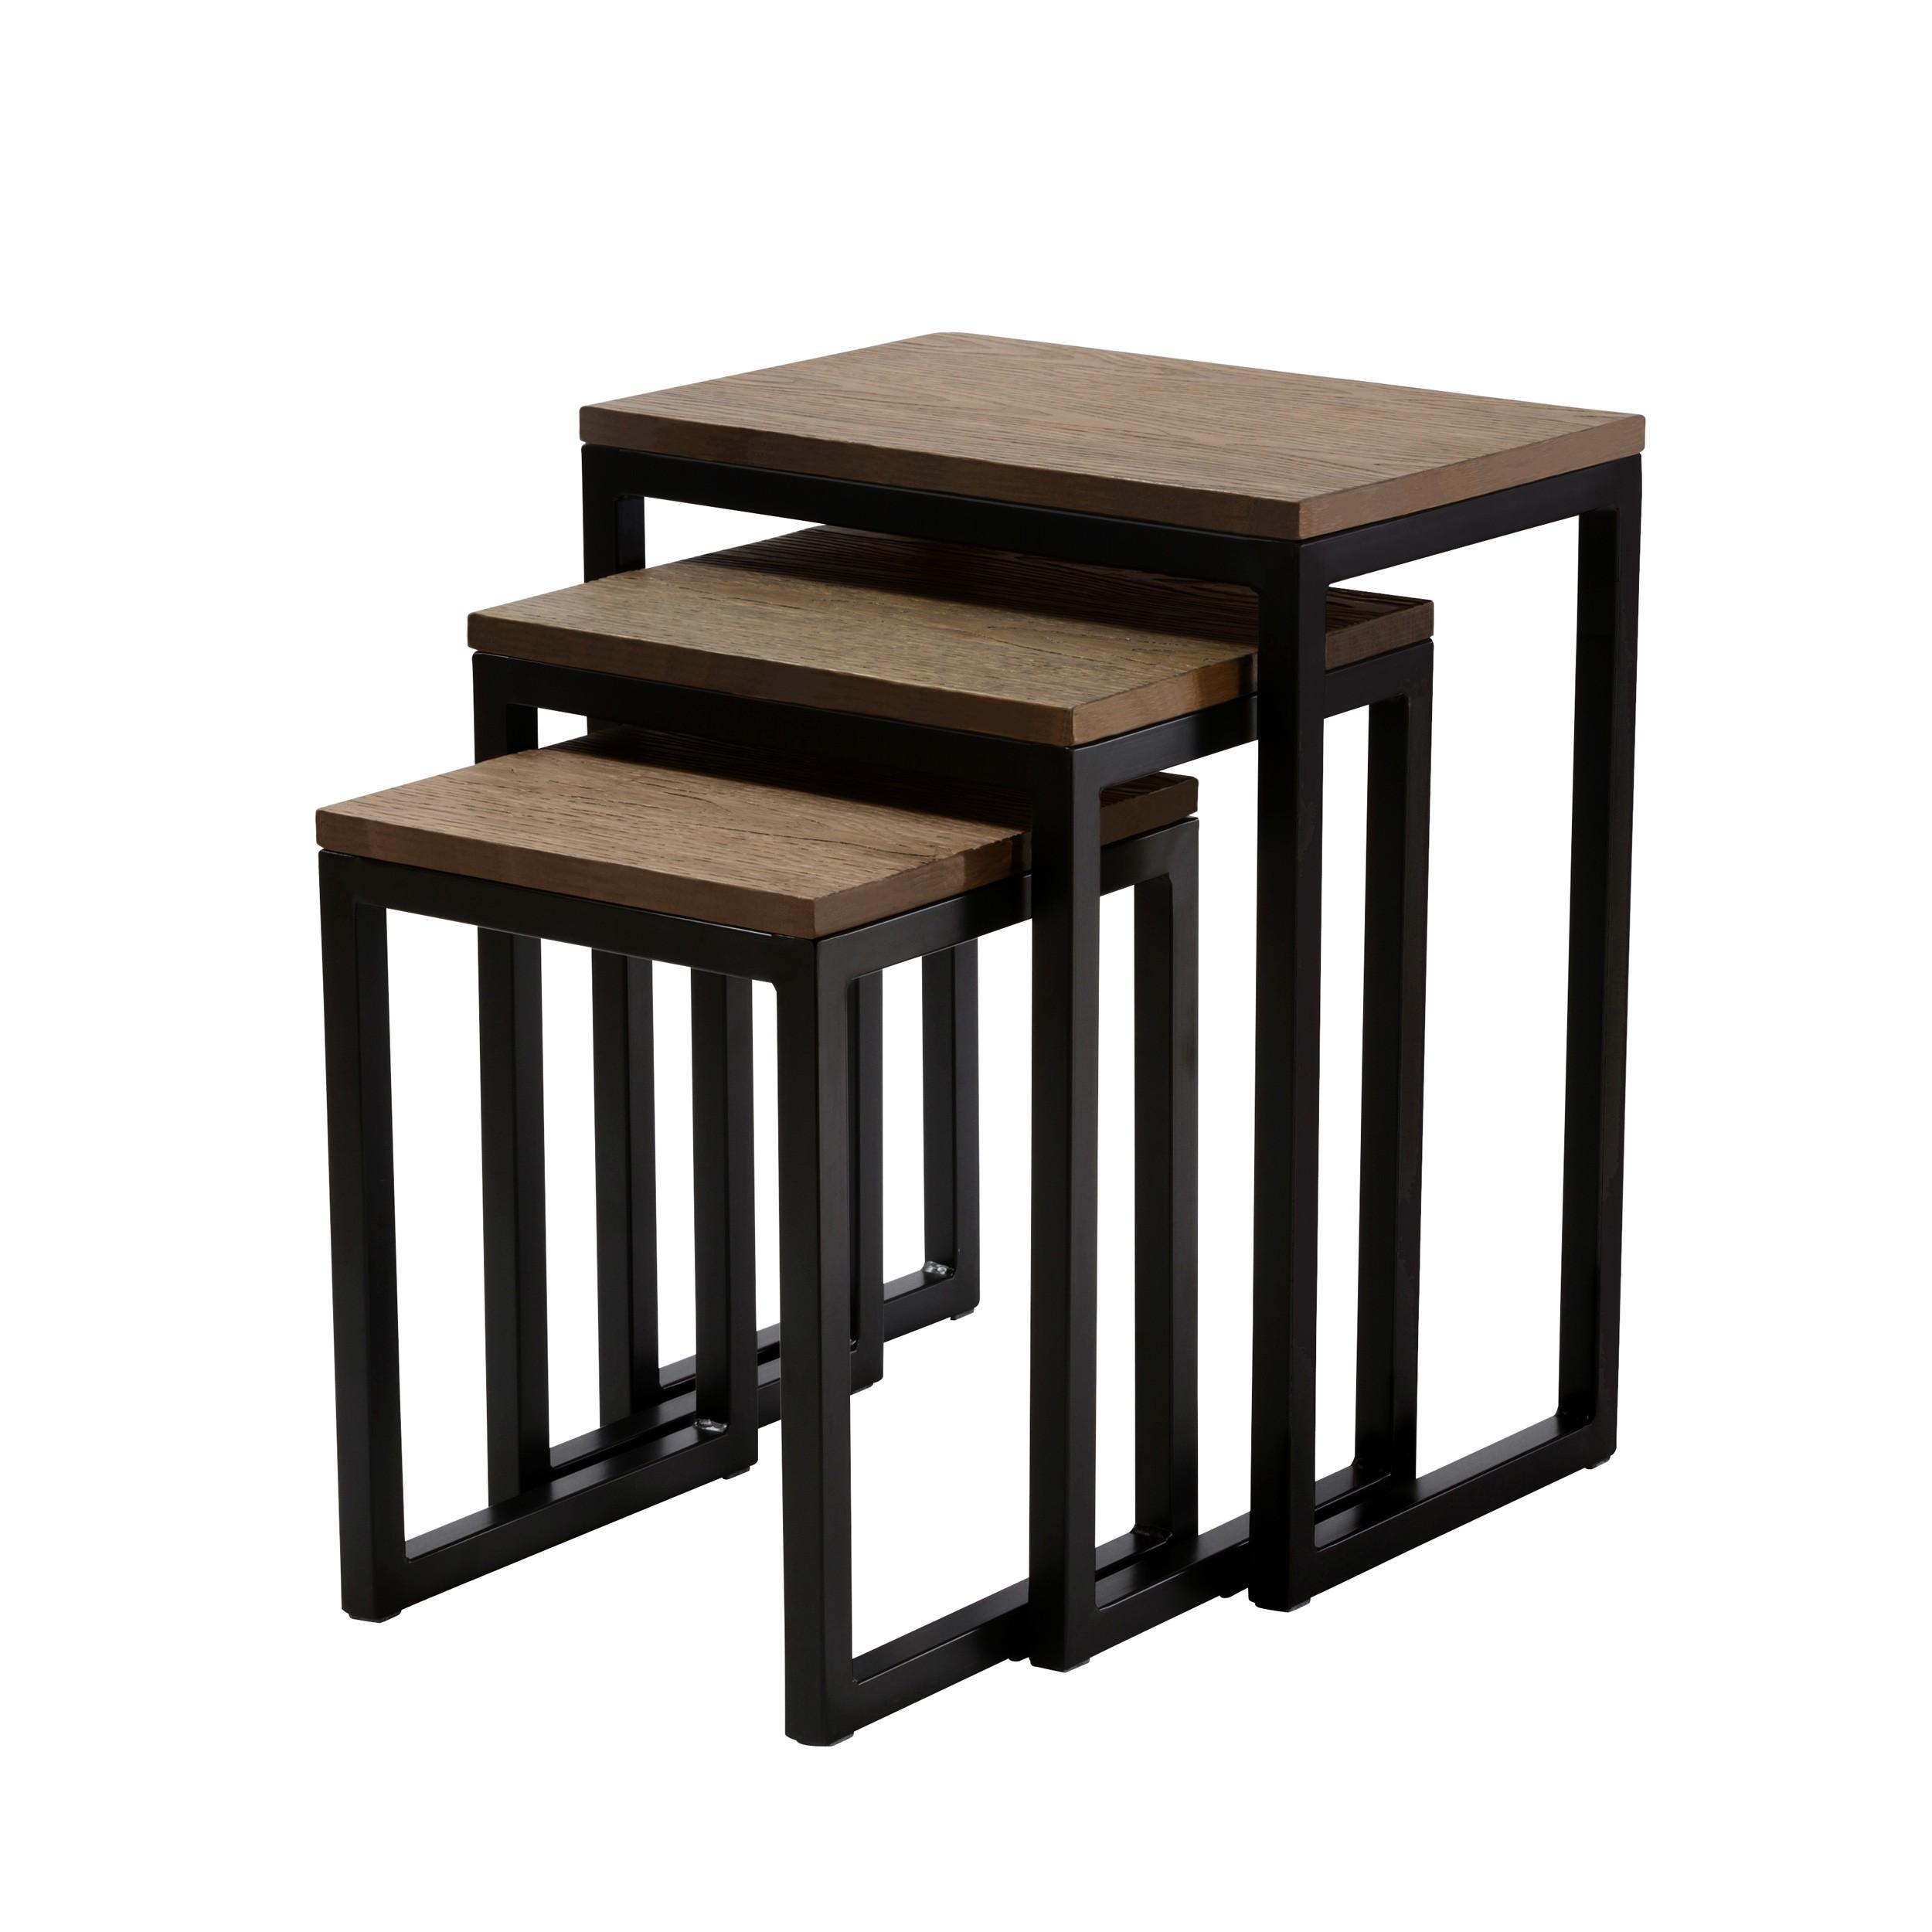 table basse kulu lot de 3 d couvrez la table basse kulu prix d 39 usine rdv d co. Black Bedroom Furniture Sets. Home Design Ideas